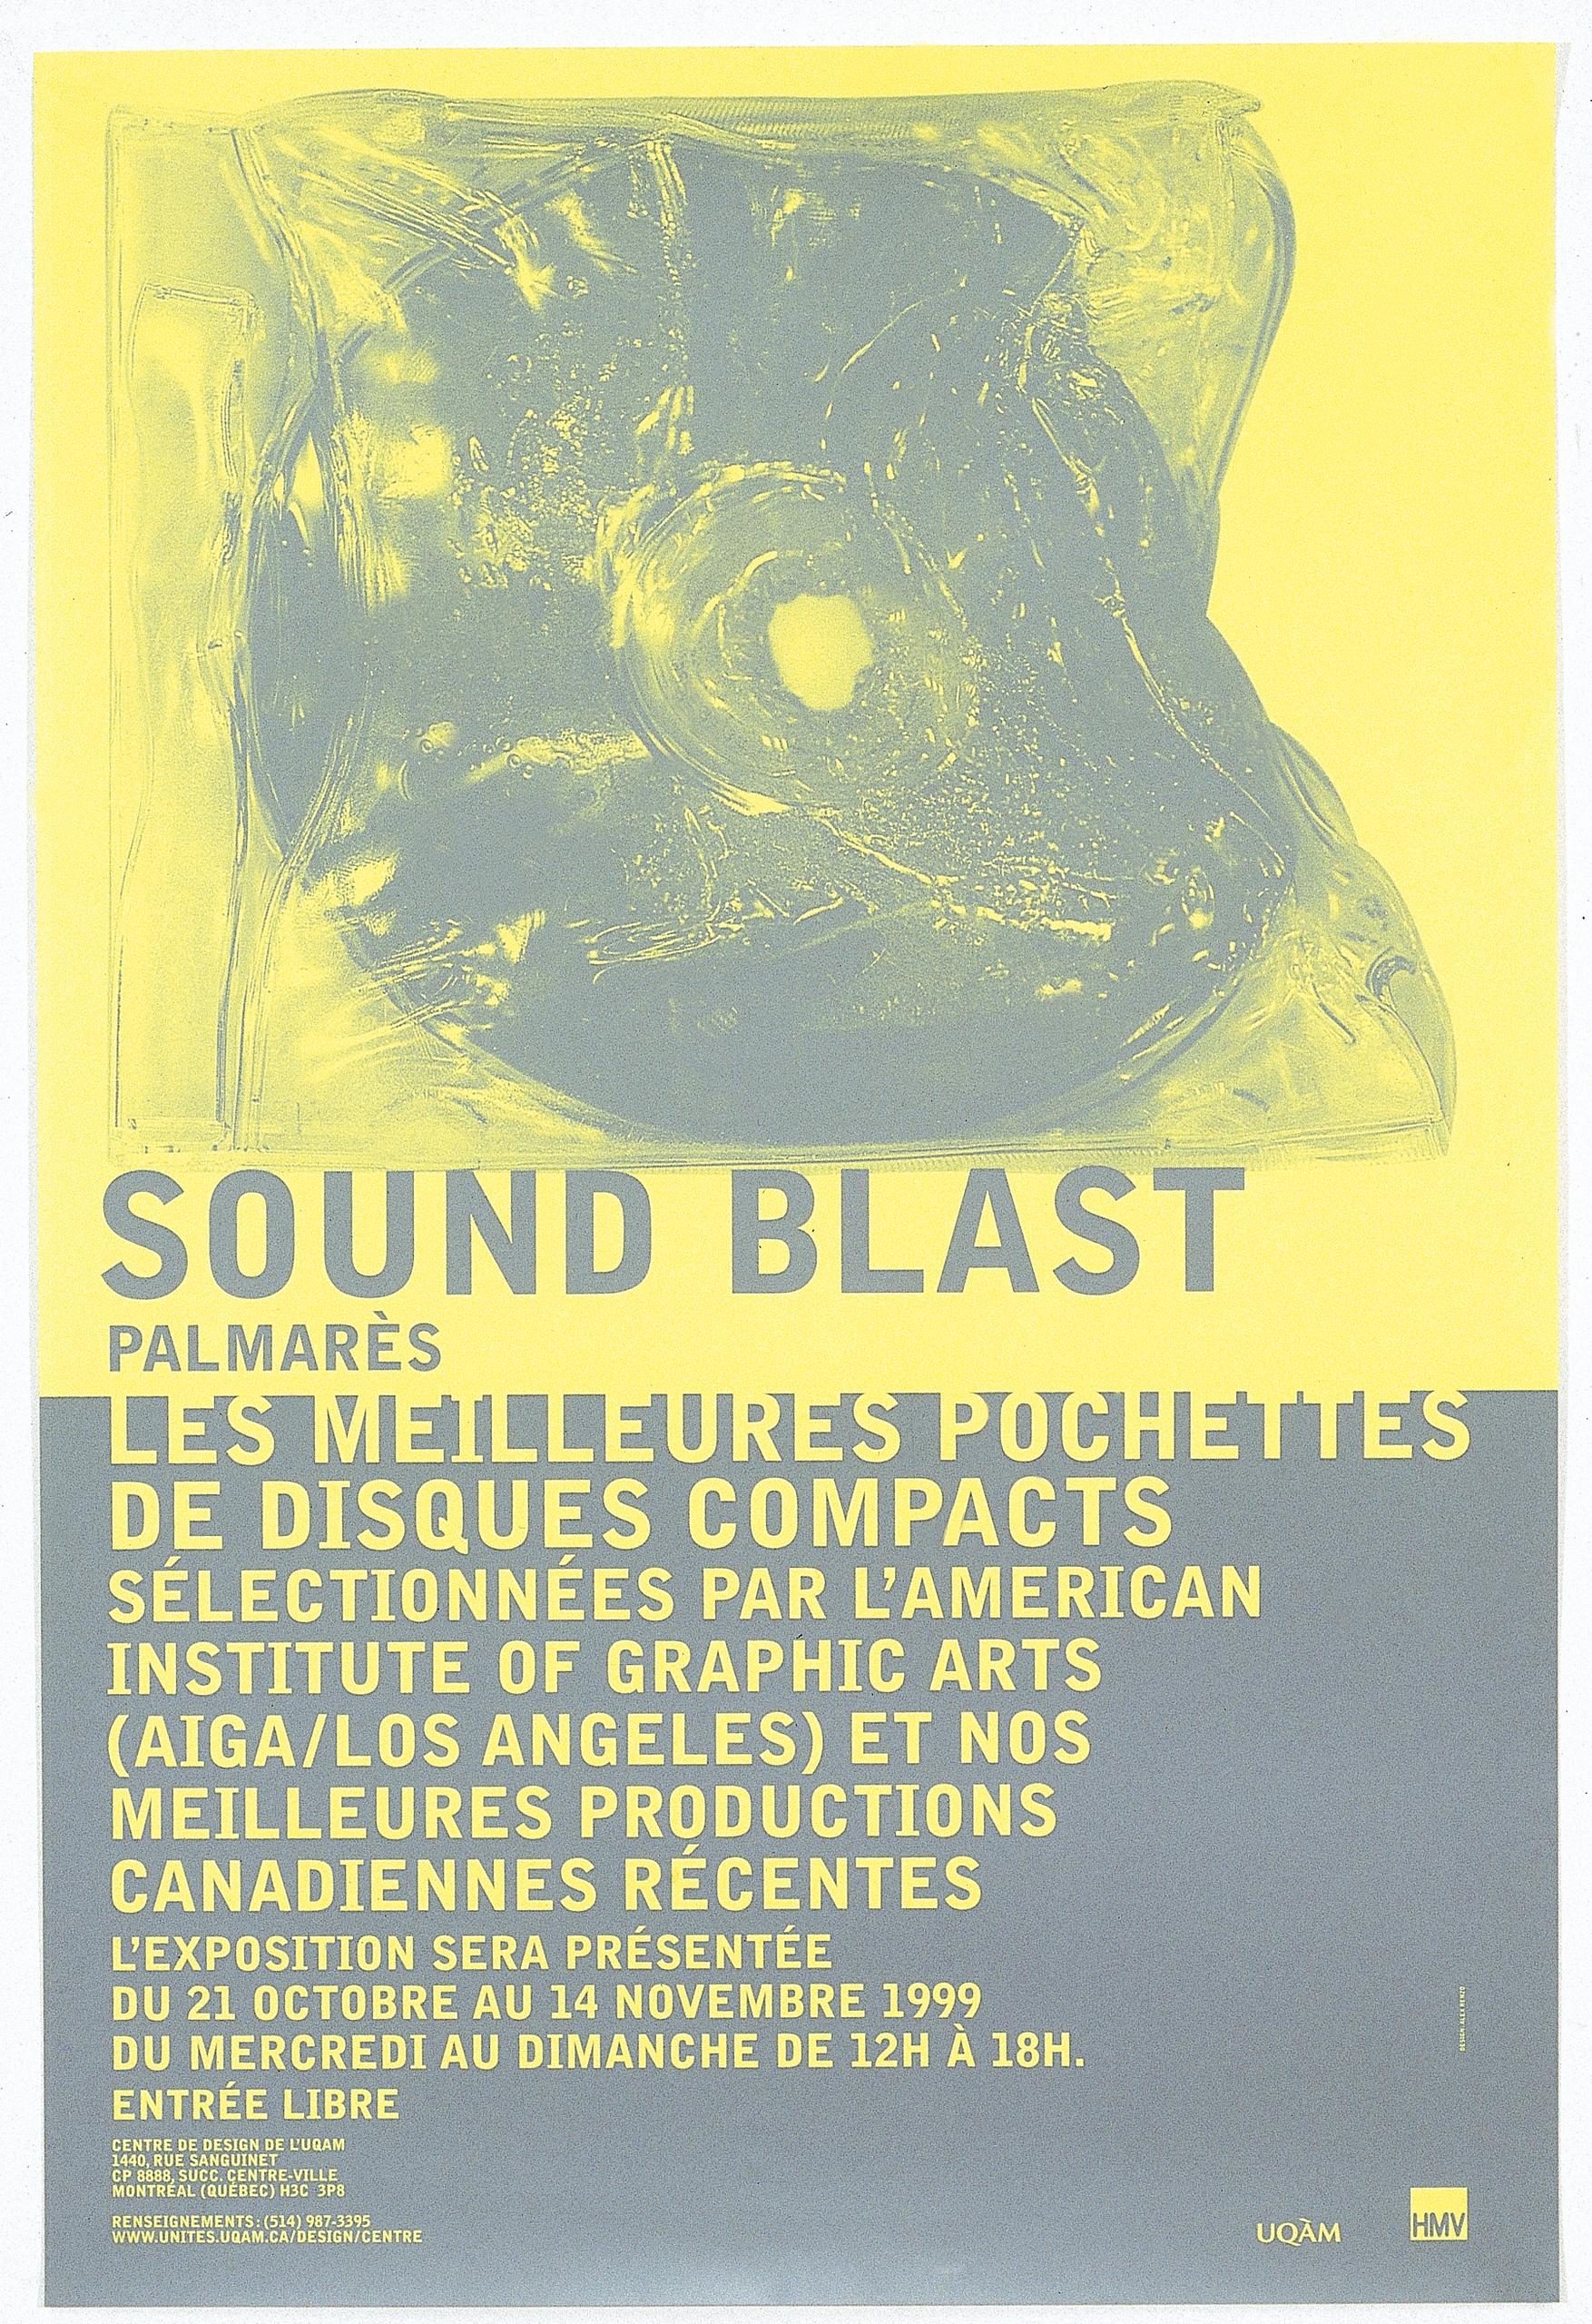 1999 - Exposition - Sound Blast palmarès ©Alexandre Renzo